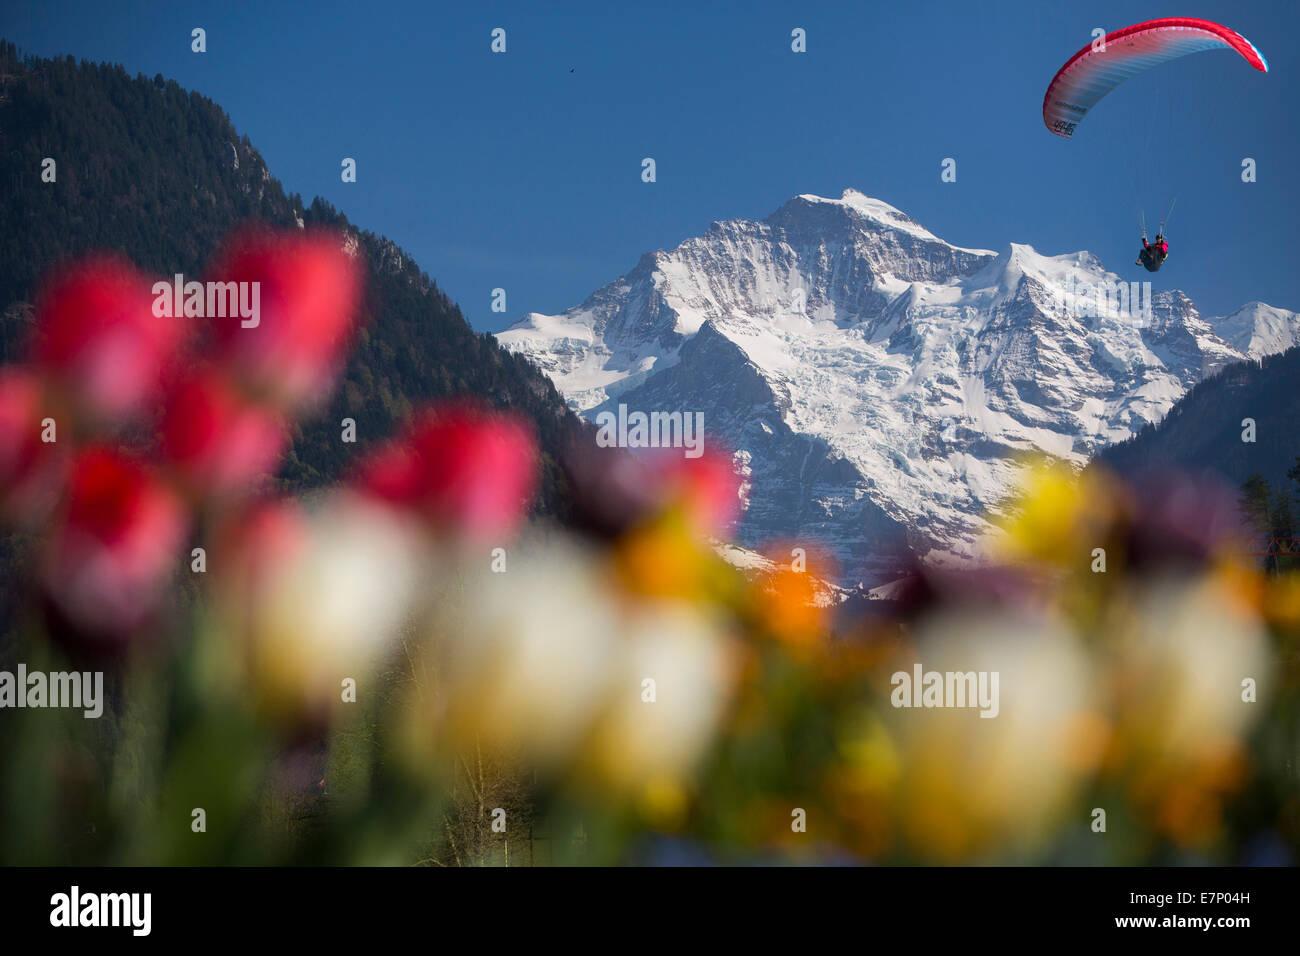 Jungfrau, paraglider, mountain, mountains, sport, spare time, adventure, canton Bern, Bernese Alps, Bernese Oberland, Stock Photo